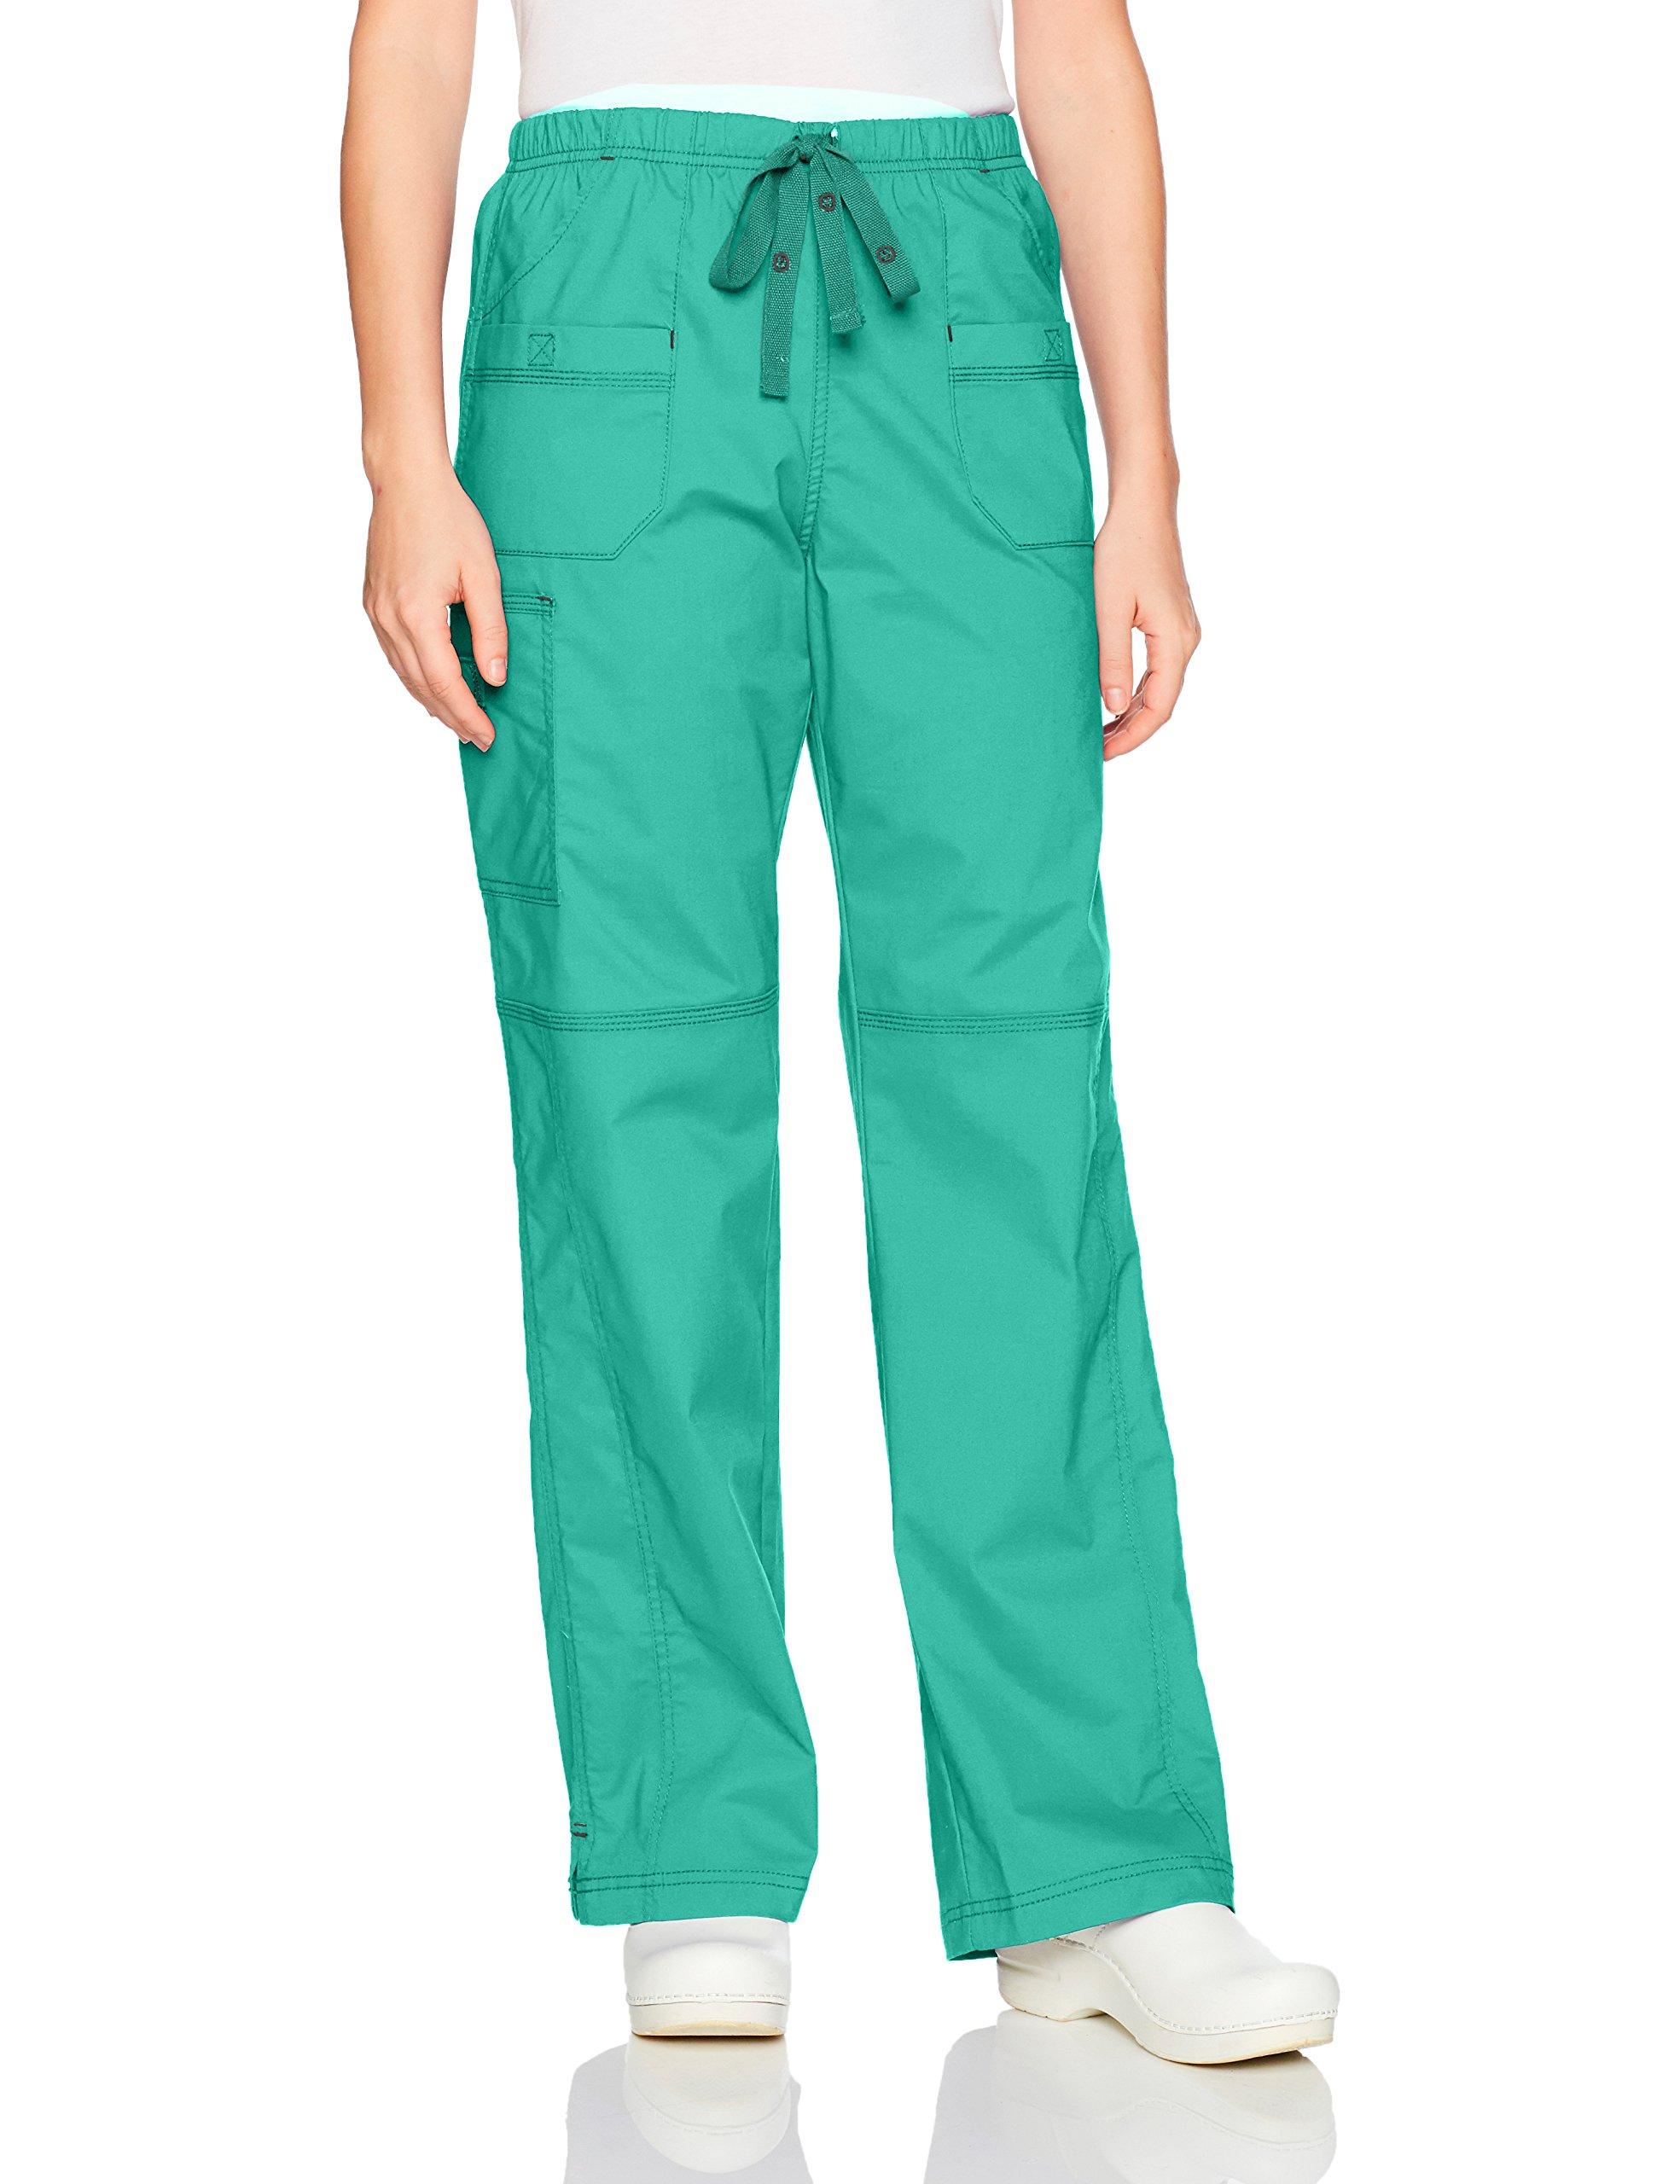 WonderWink Women's Faith Multi-Pocket Cargo Pant, Surgical Green, Medium by WonderWink